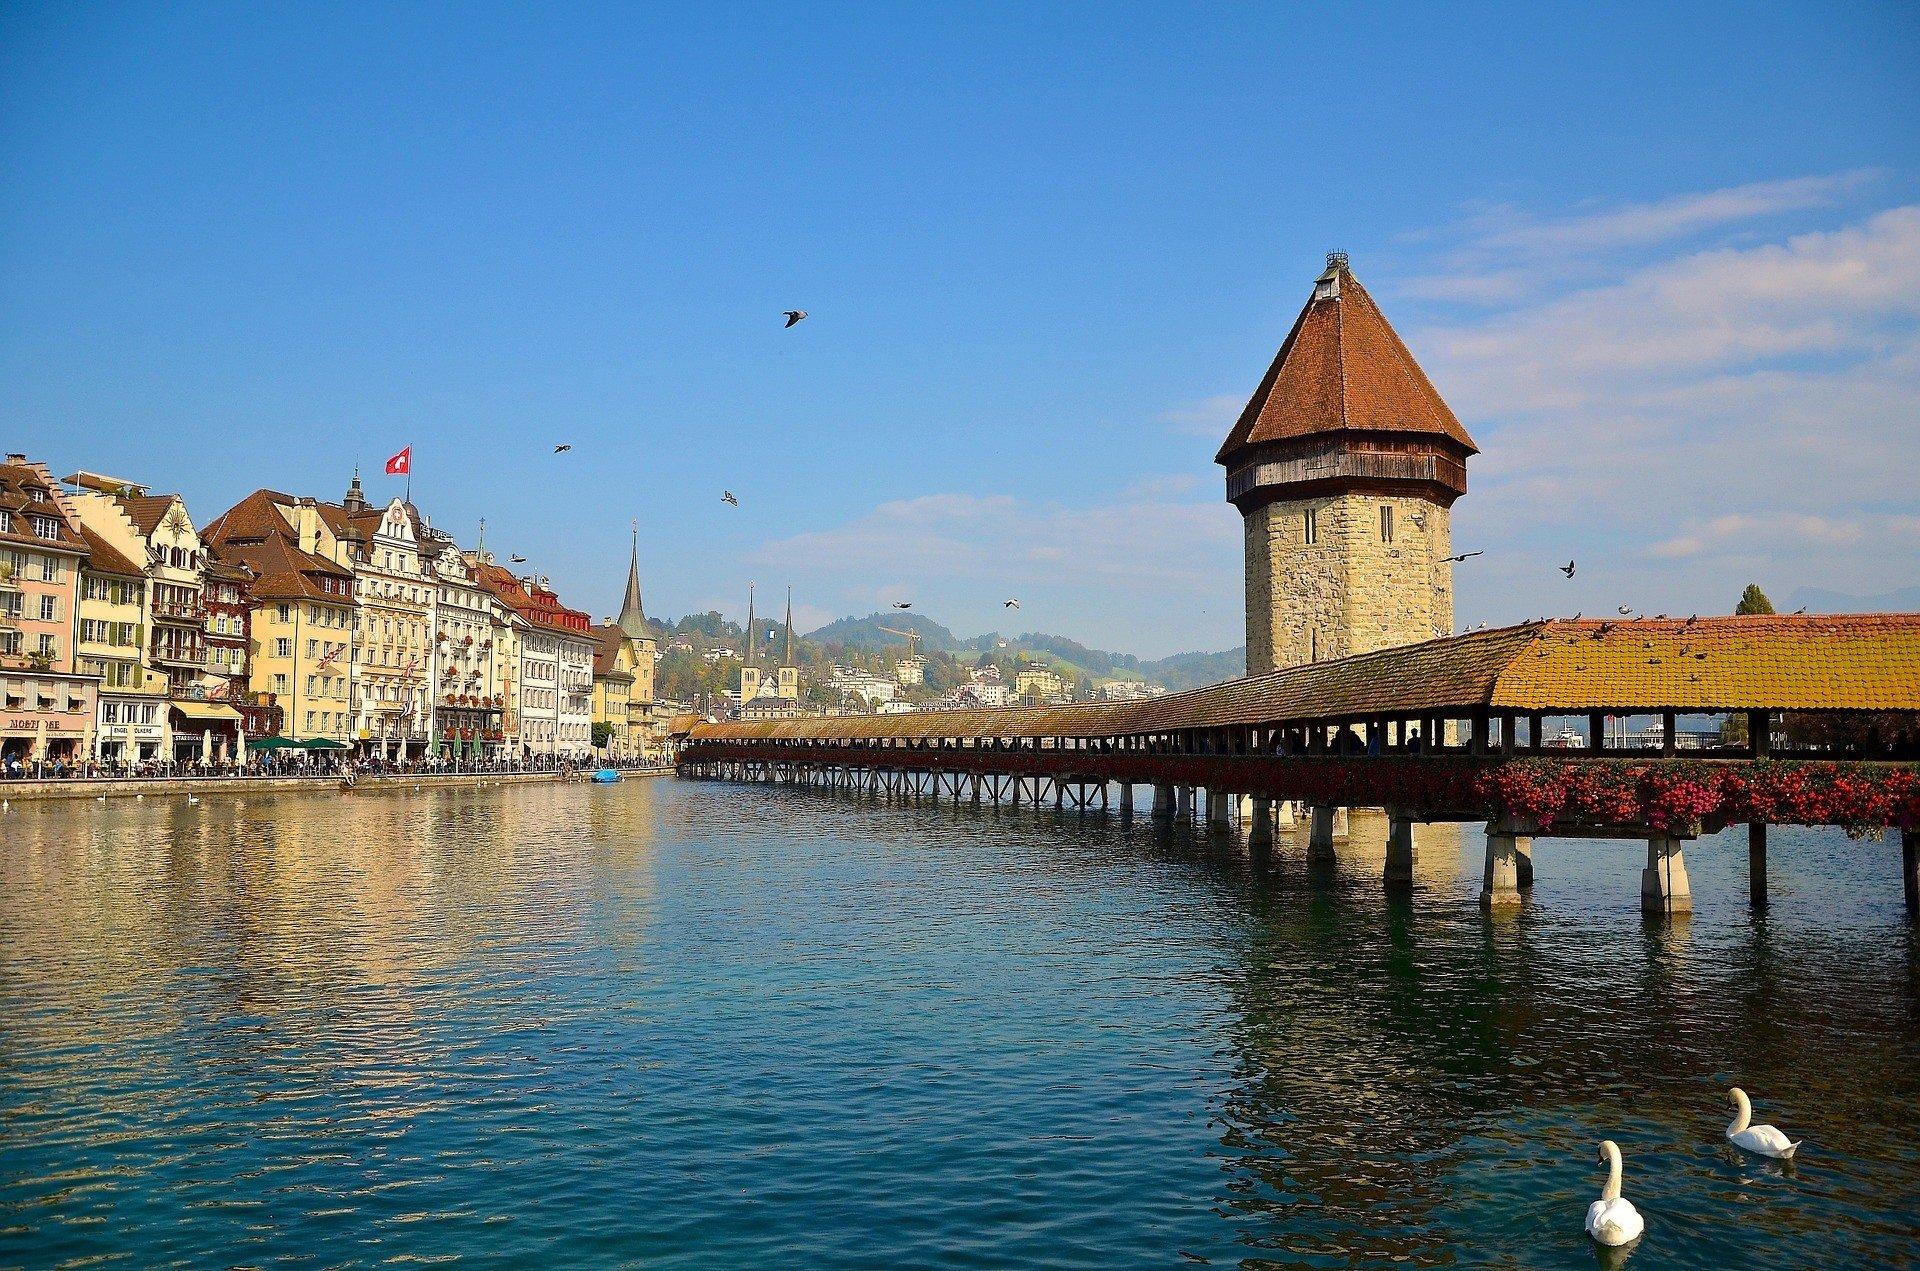 Altstadt (Old Town), Lucerne